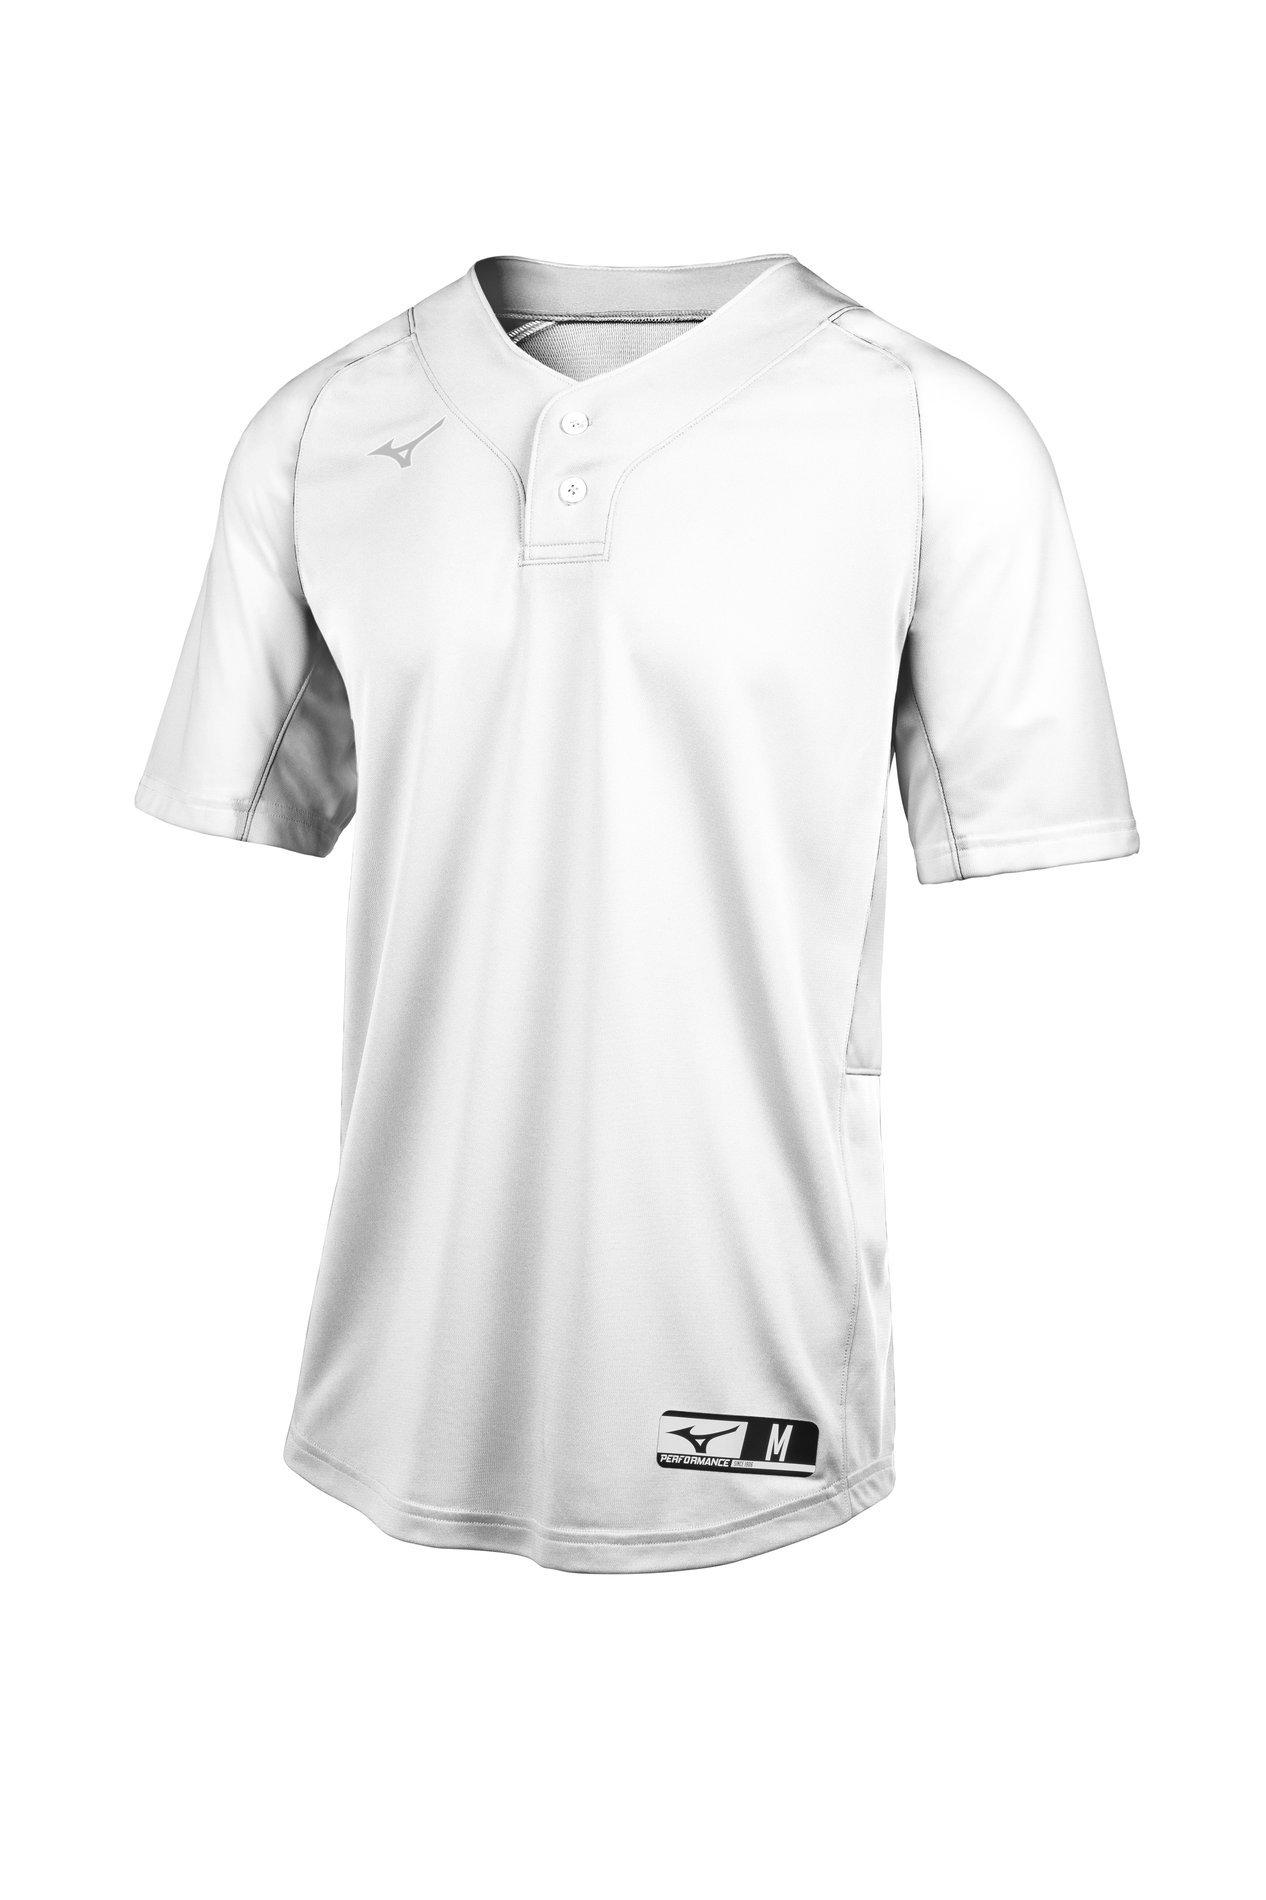 Large Navy-Grey Mizuno Aerolite 2-Button Fastpitch Softball Jersey